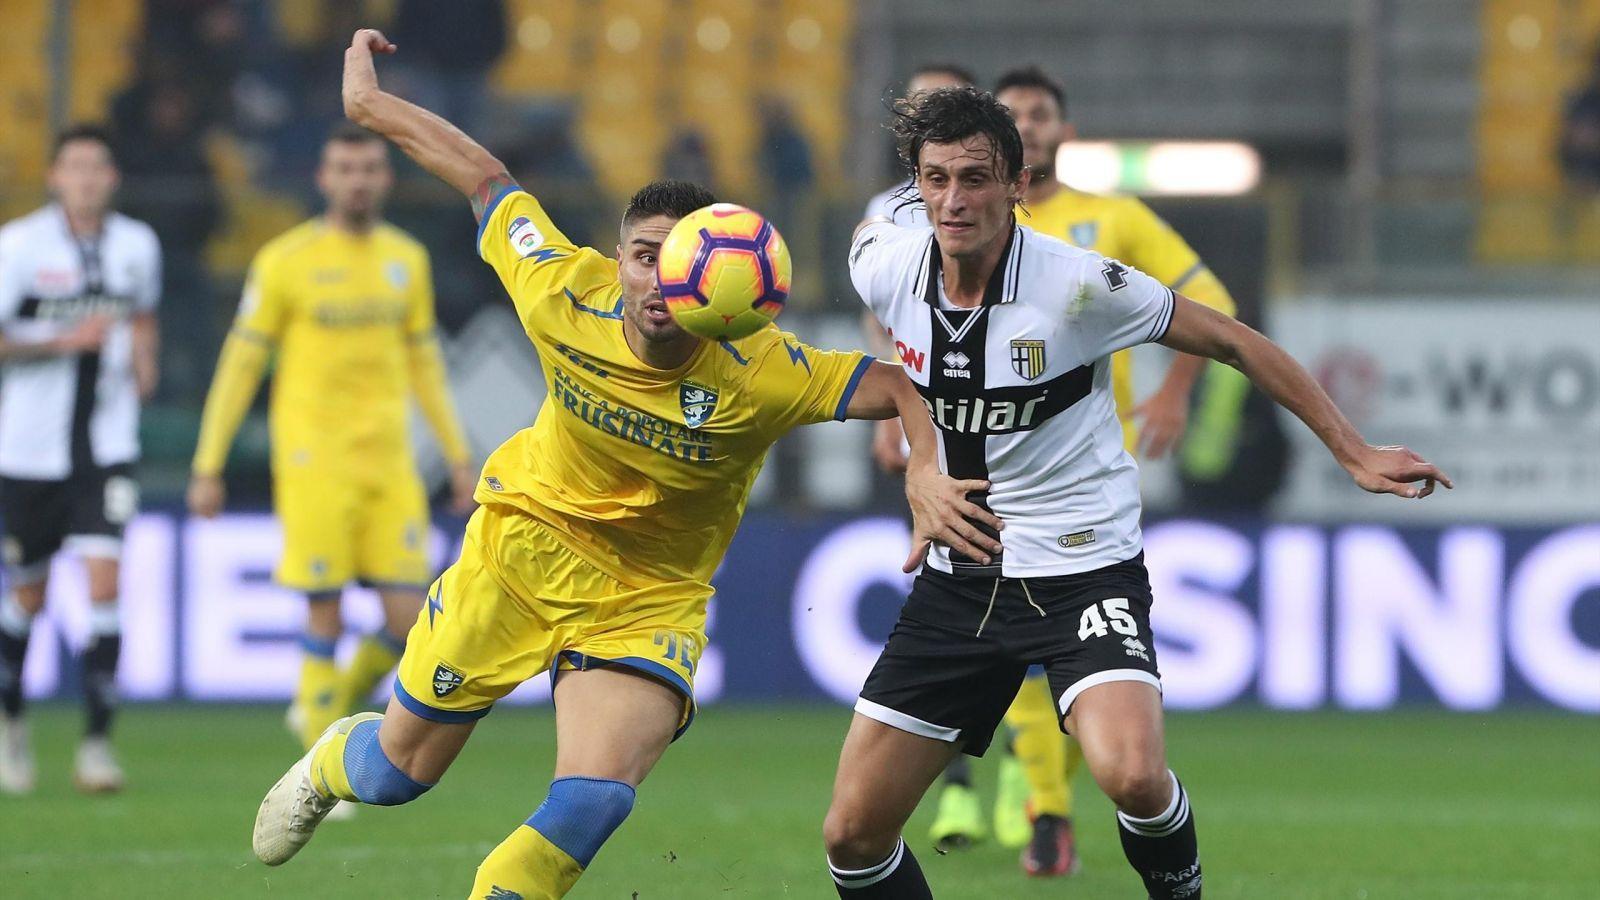 Torino vs frosinone betting preview goal tab fixed odds betting nz